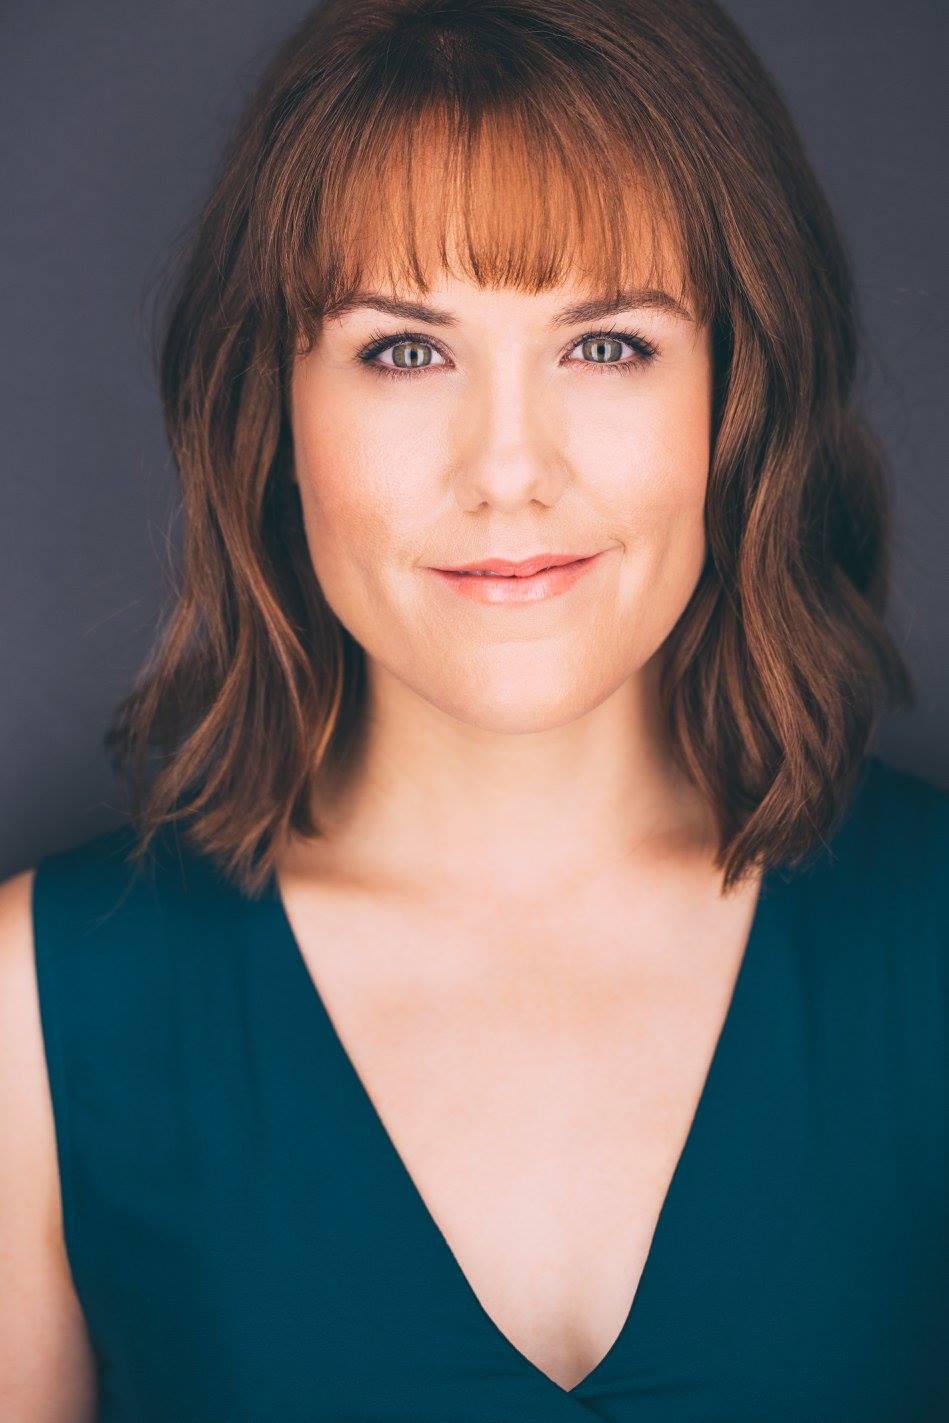 Emily KochBroadway Best Vocal Coach Matt Farnsworth Vocal Studio Best Voice Teacher in the World NY MF Voice app Singing